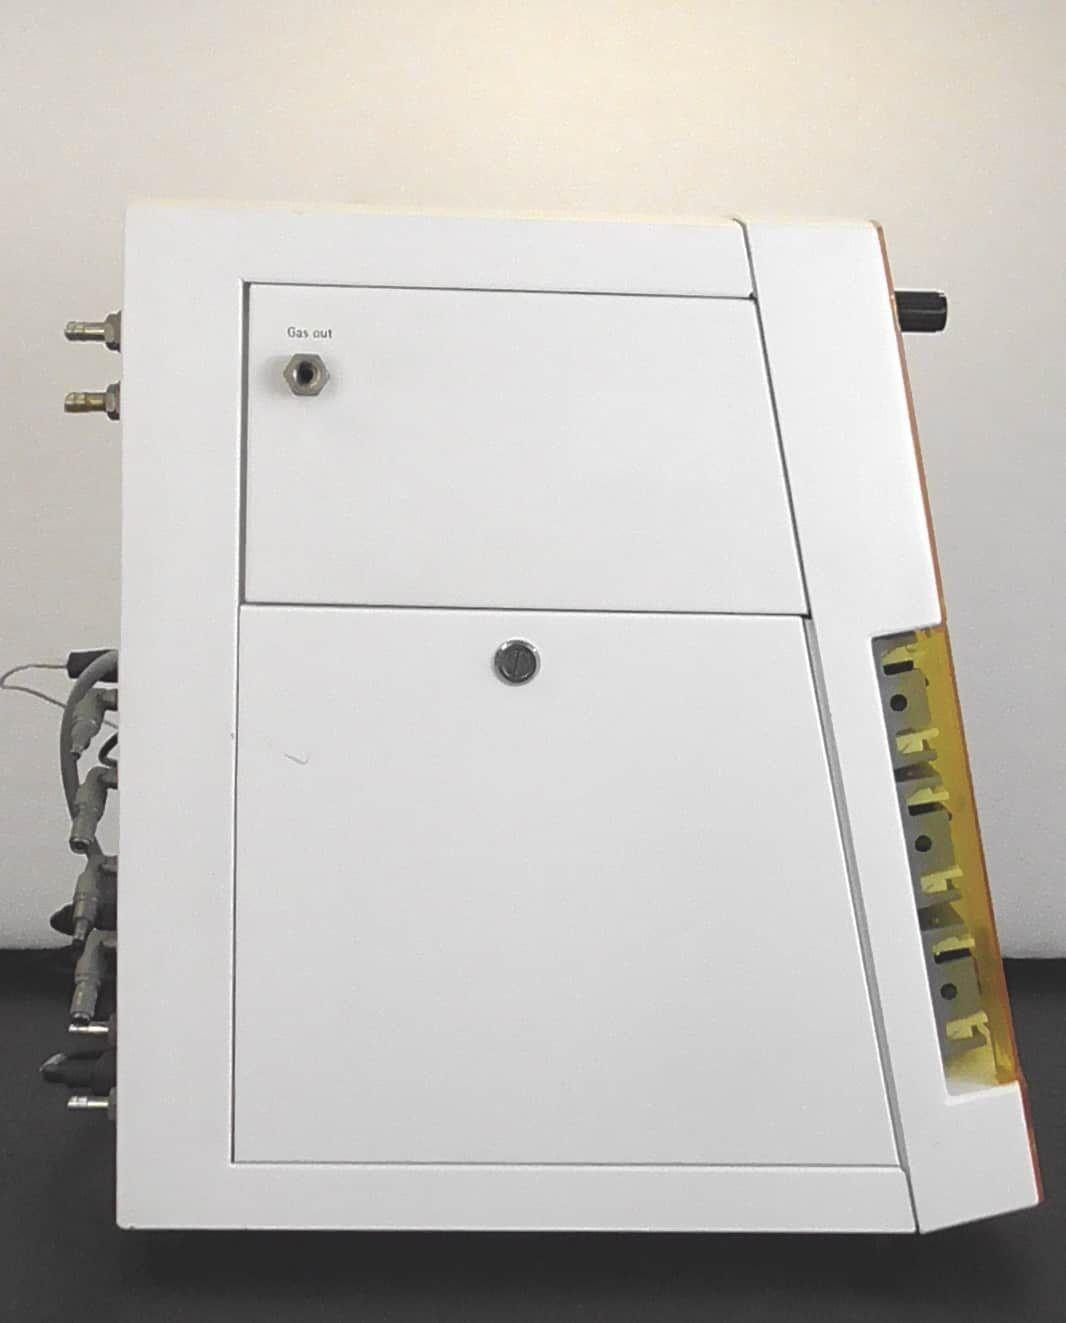 Sartorius Biostat A Plus Bioreactor System with 2 Liter Vessel